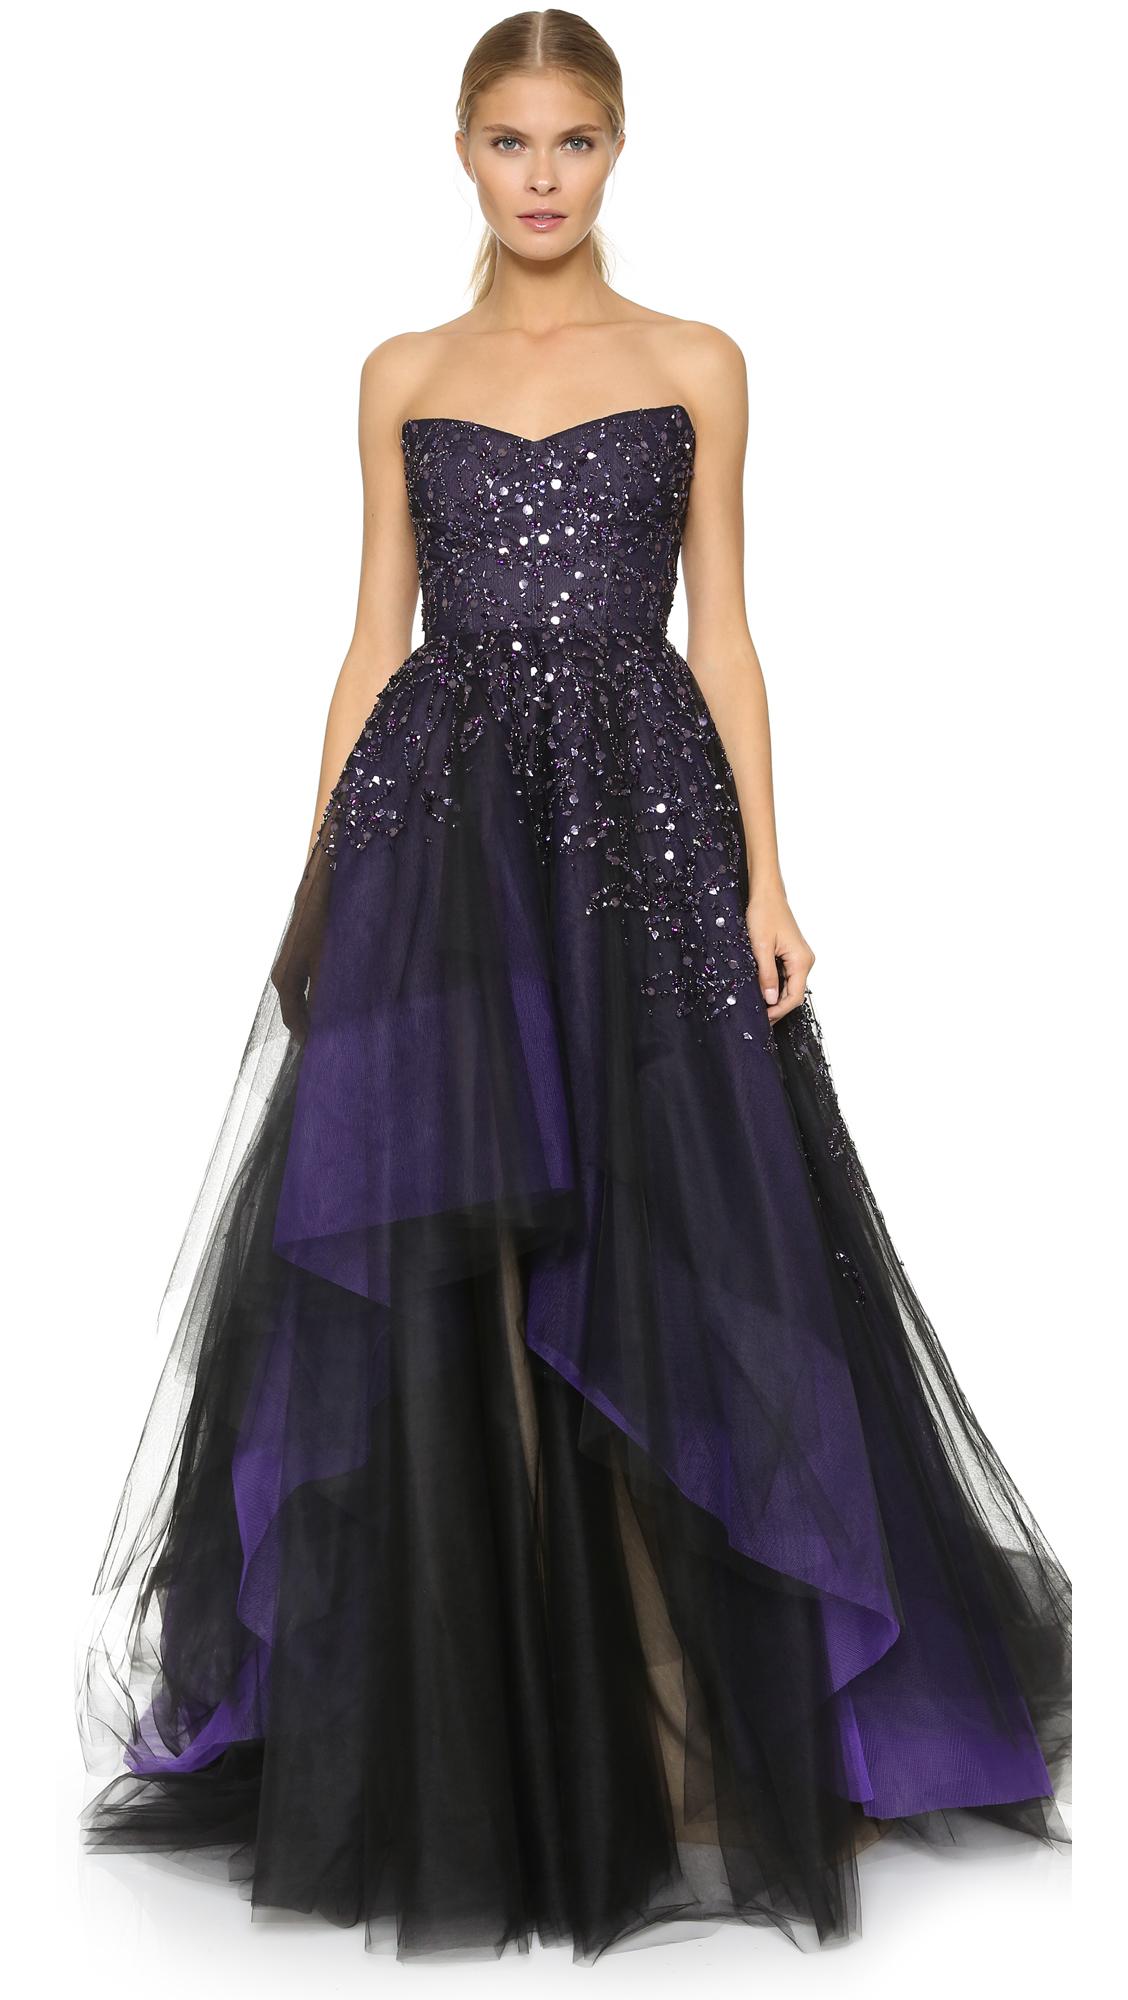 Lyst - Monique Lhuillier Strapless Ball Gown - Deep Plum in Purple